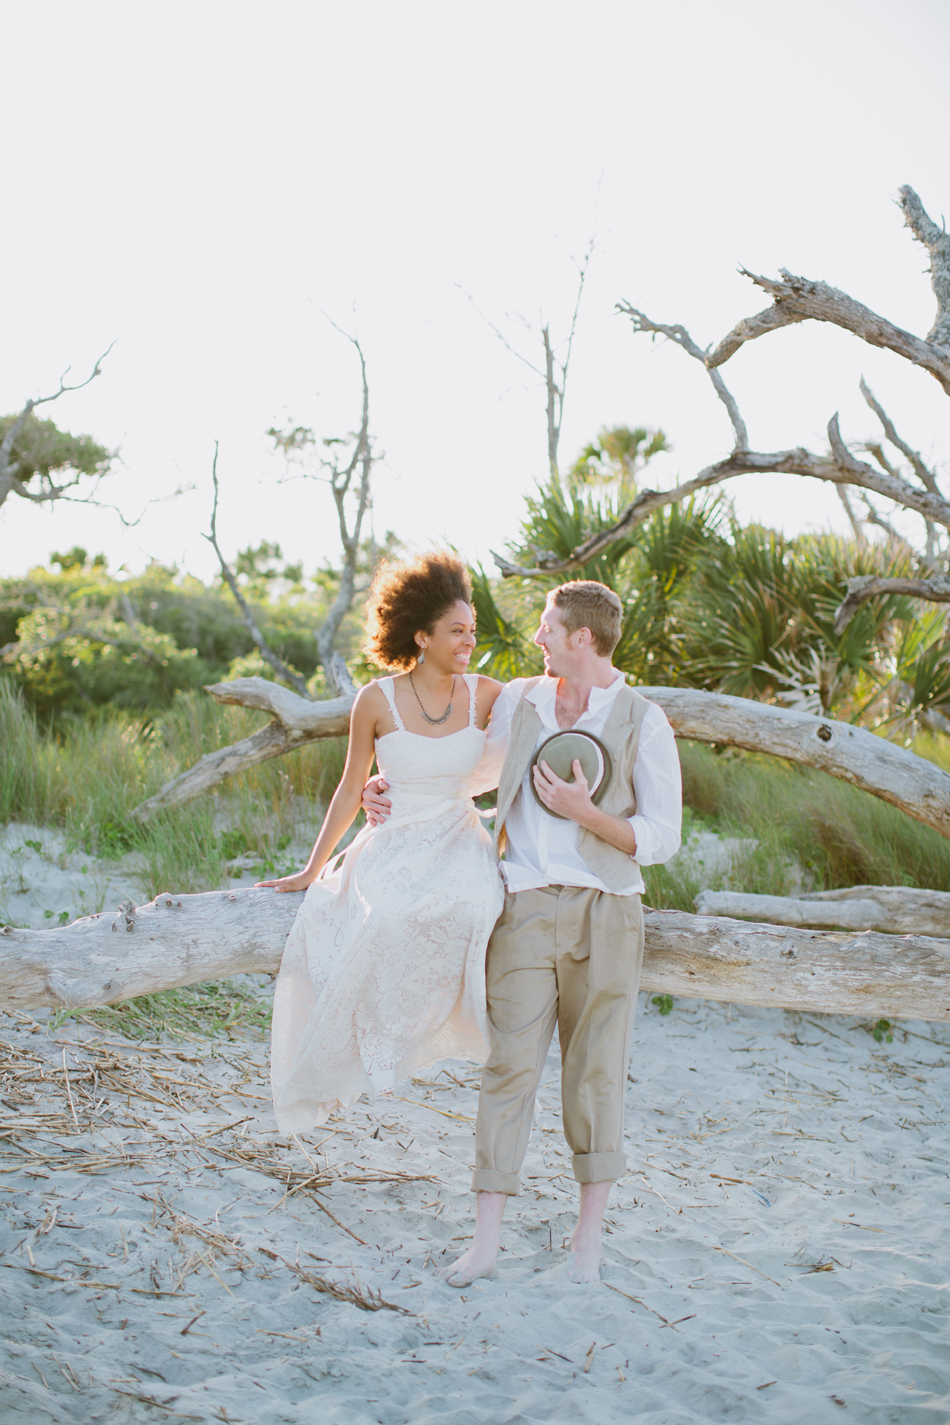 Jameykay_arlie_bohemian_elopement_styled_shoot034.jpg